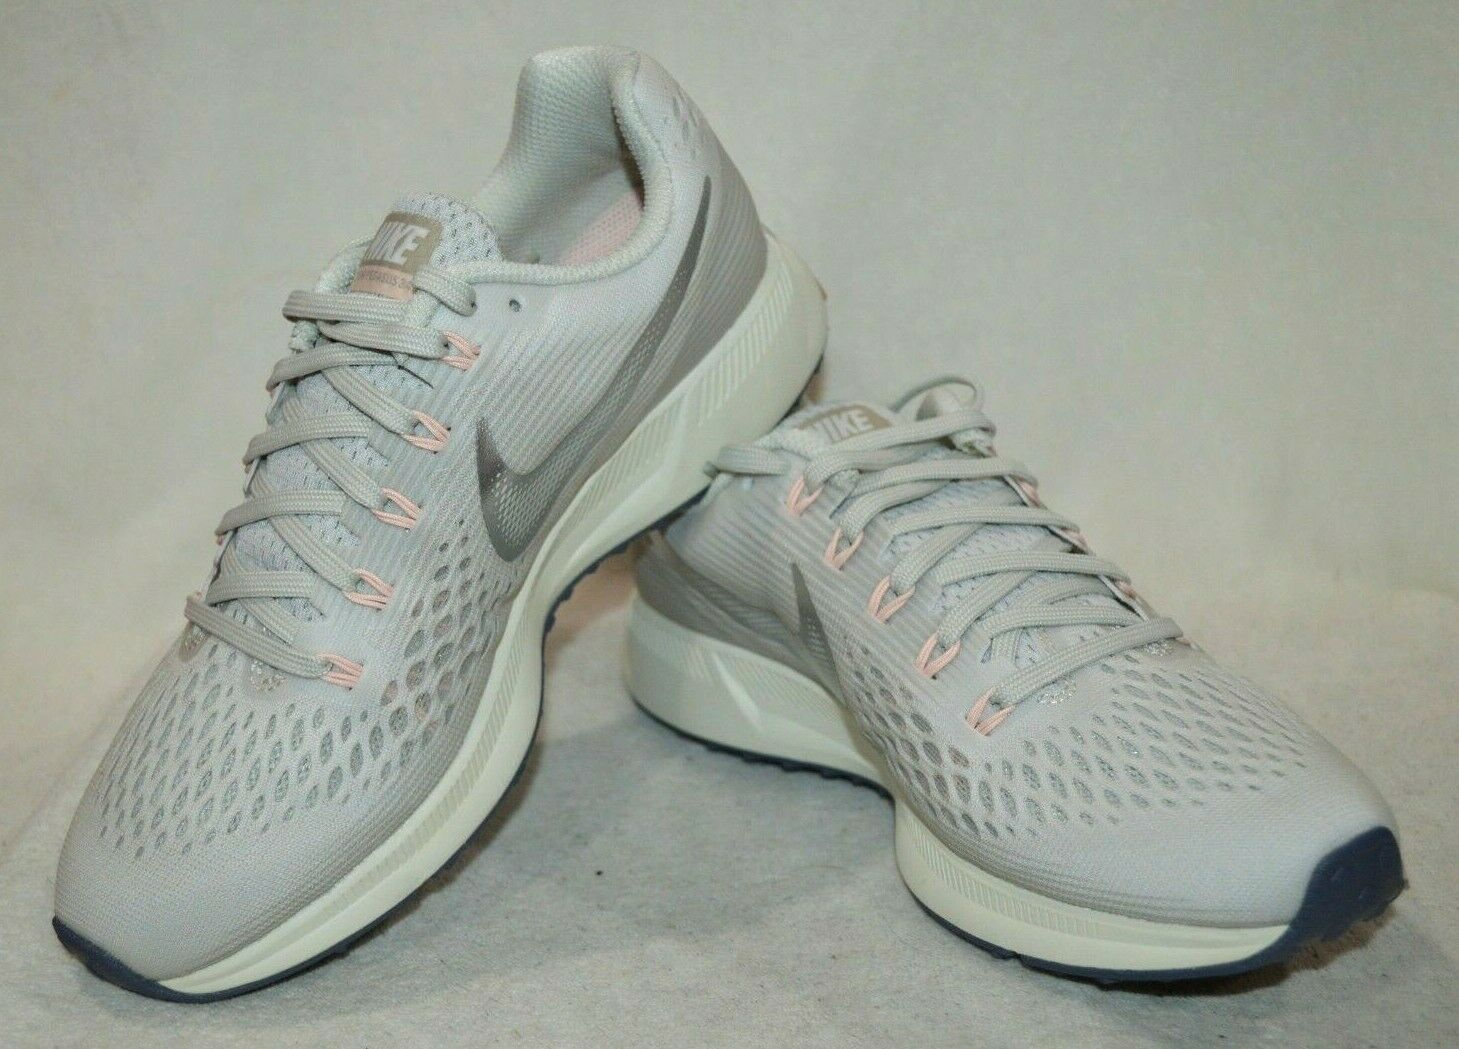 Nike Air Zoom Pegasus 34 Light Bone Chrome Wouomo Running scarpe-Asst Dimensiones NWB